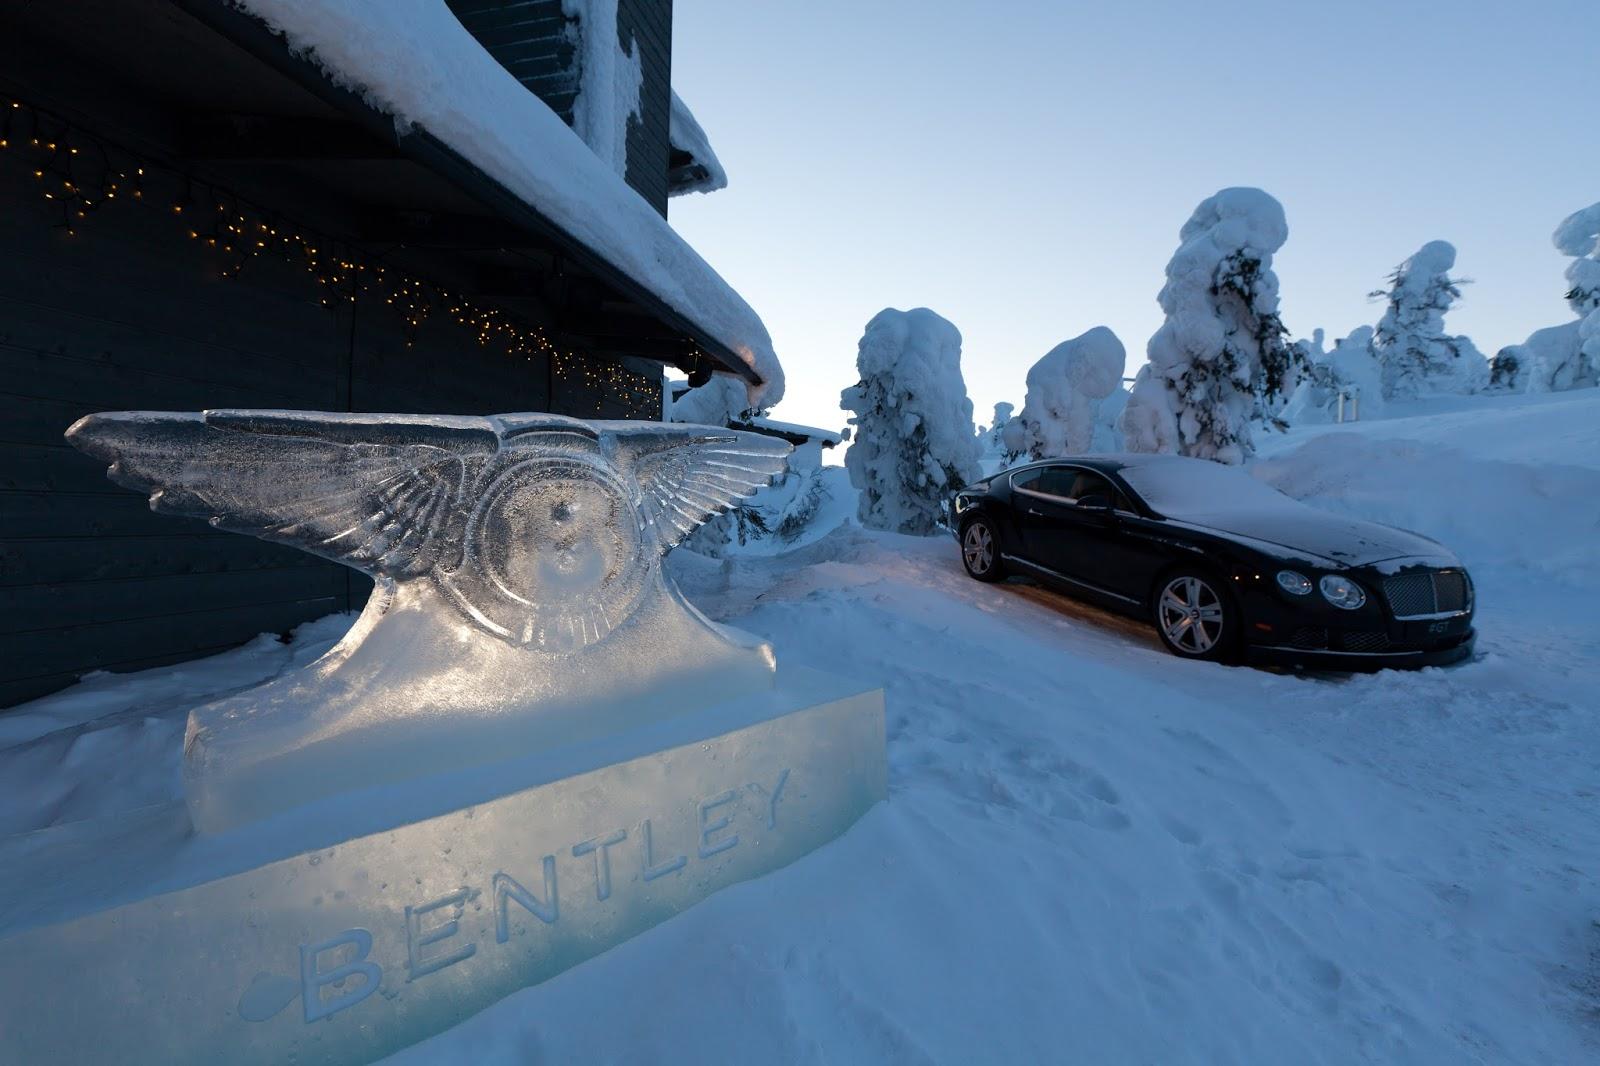 Bentayga%2Bmakes%2BPower%2Bon%2BIce%2BDebut%2B%25283%2529 Οδήγησε την Bentley Bentayga παρέα με τον Juha Kankkunen